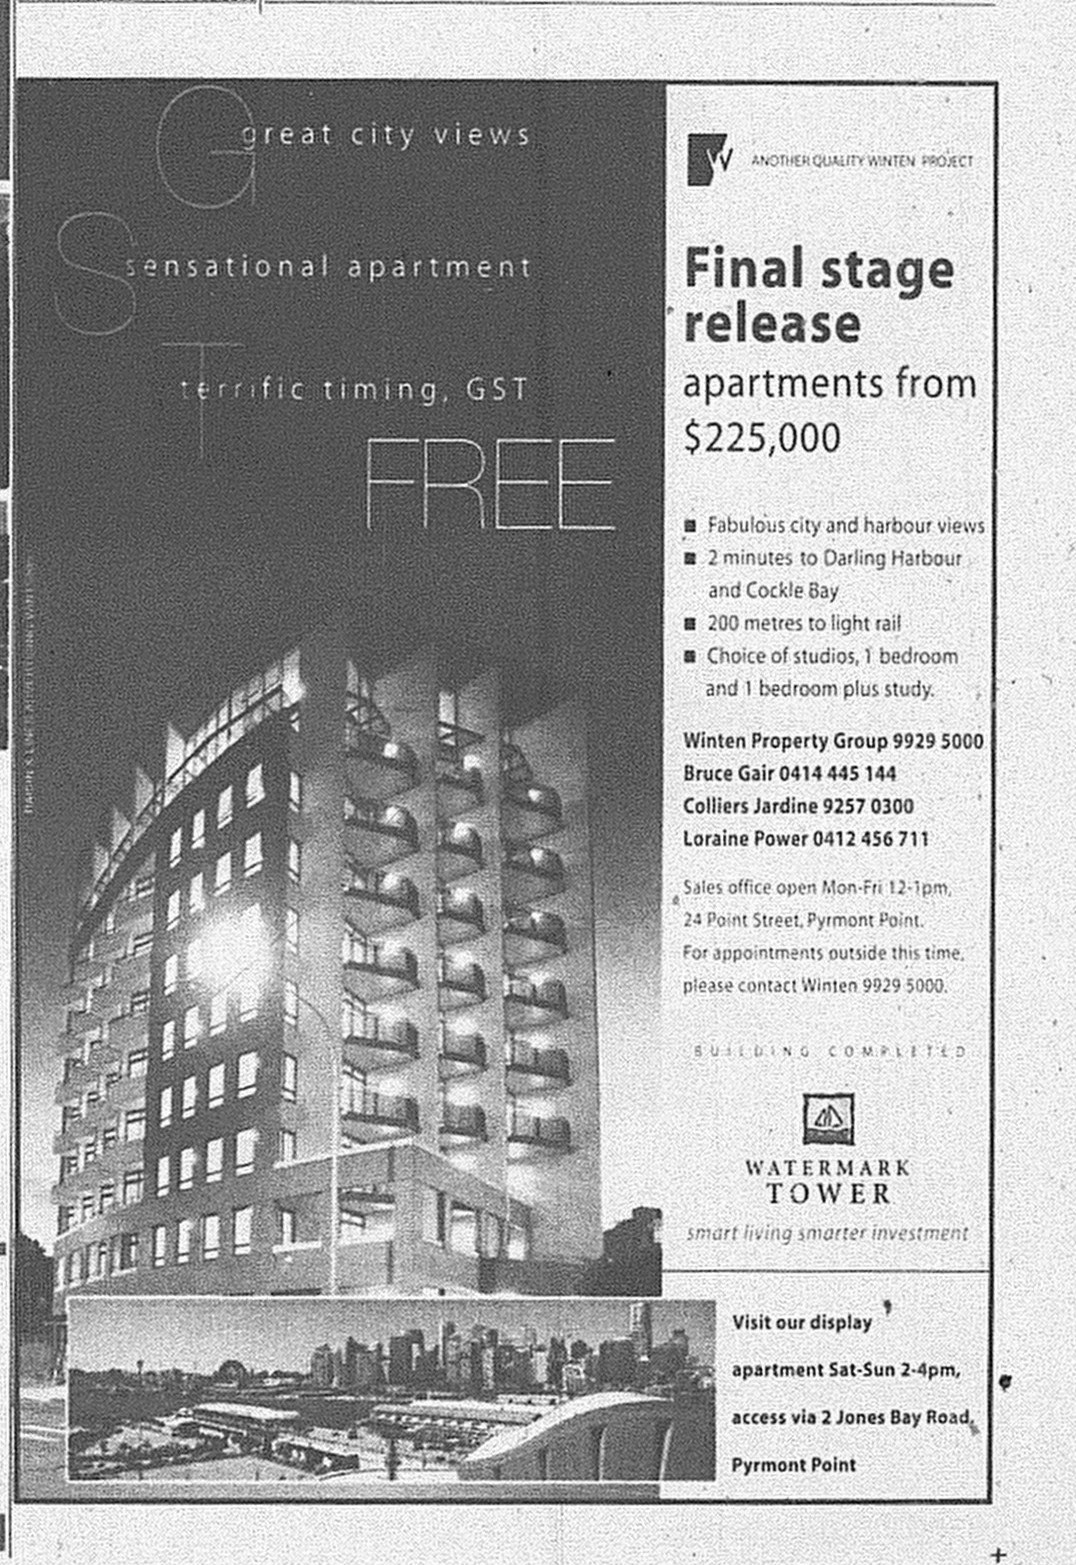 Watermark Tower June 10 2000 SMH Domain 21A